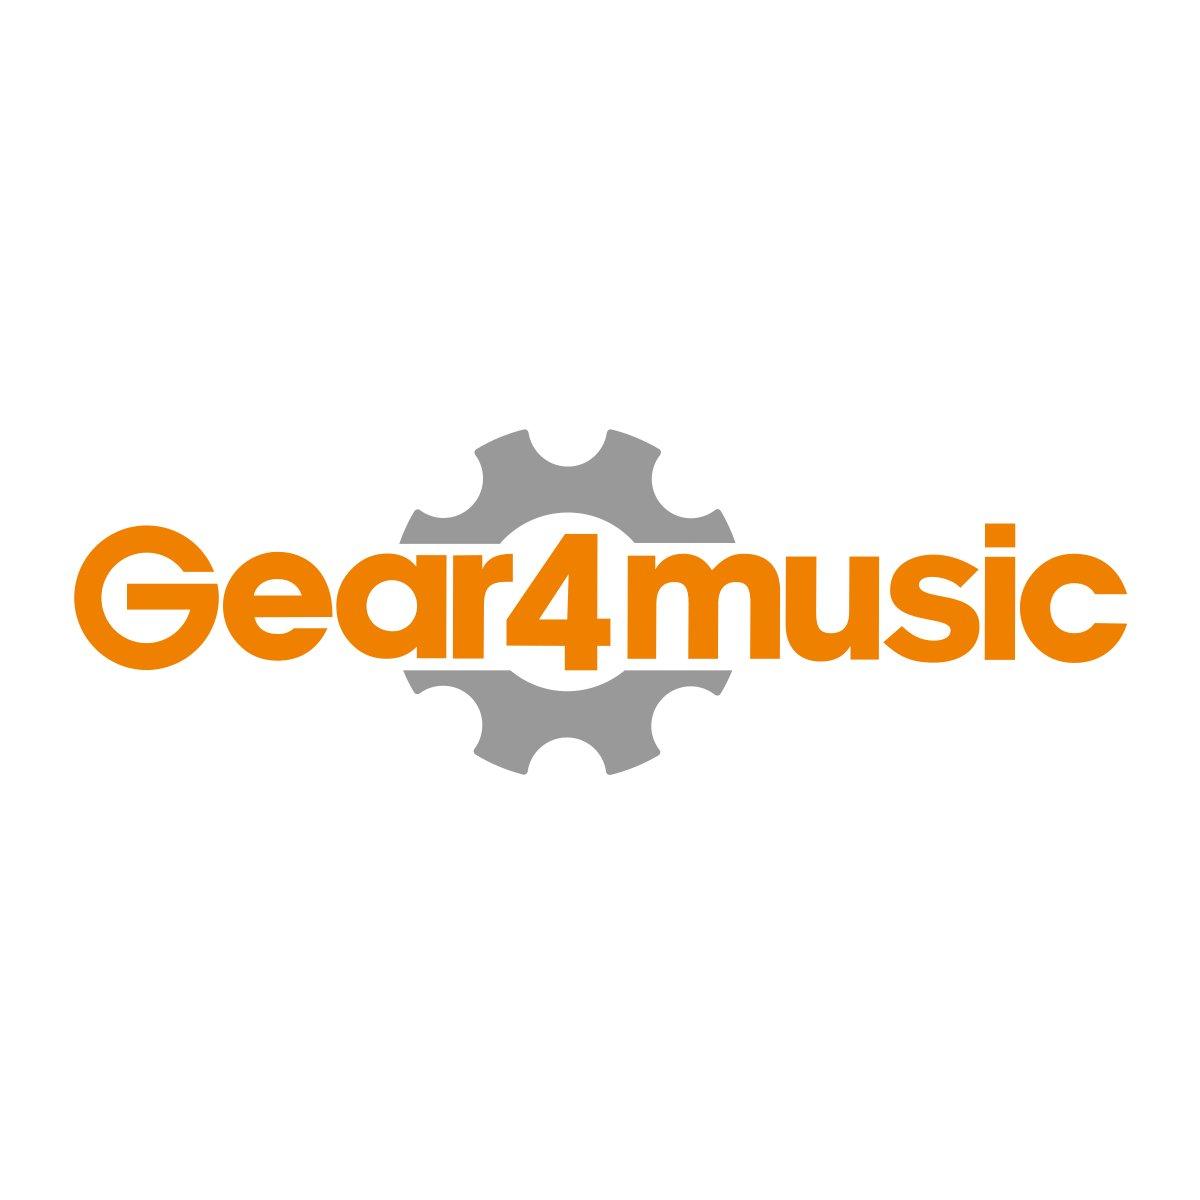 harlem 7 7 string electric guitar by gear4music black at gear4music. Black Bedroom Furniture Sets. Home Design Ideas